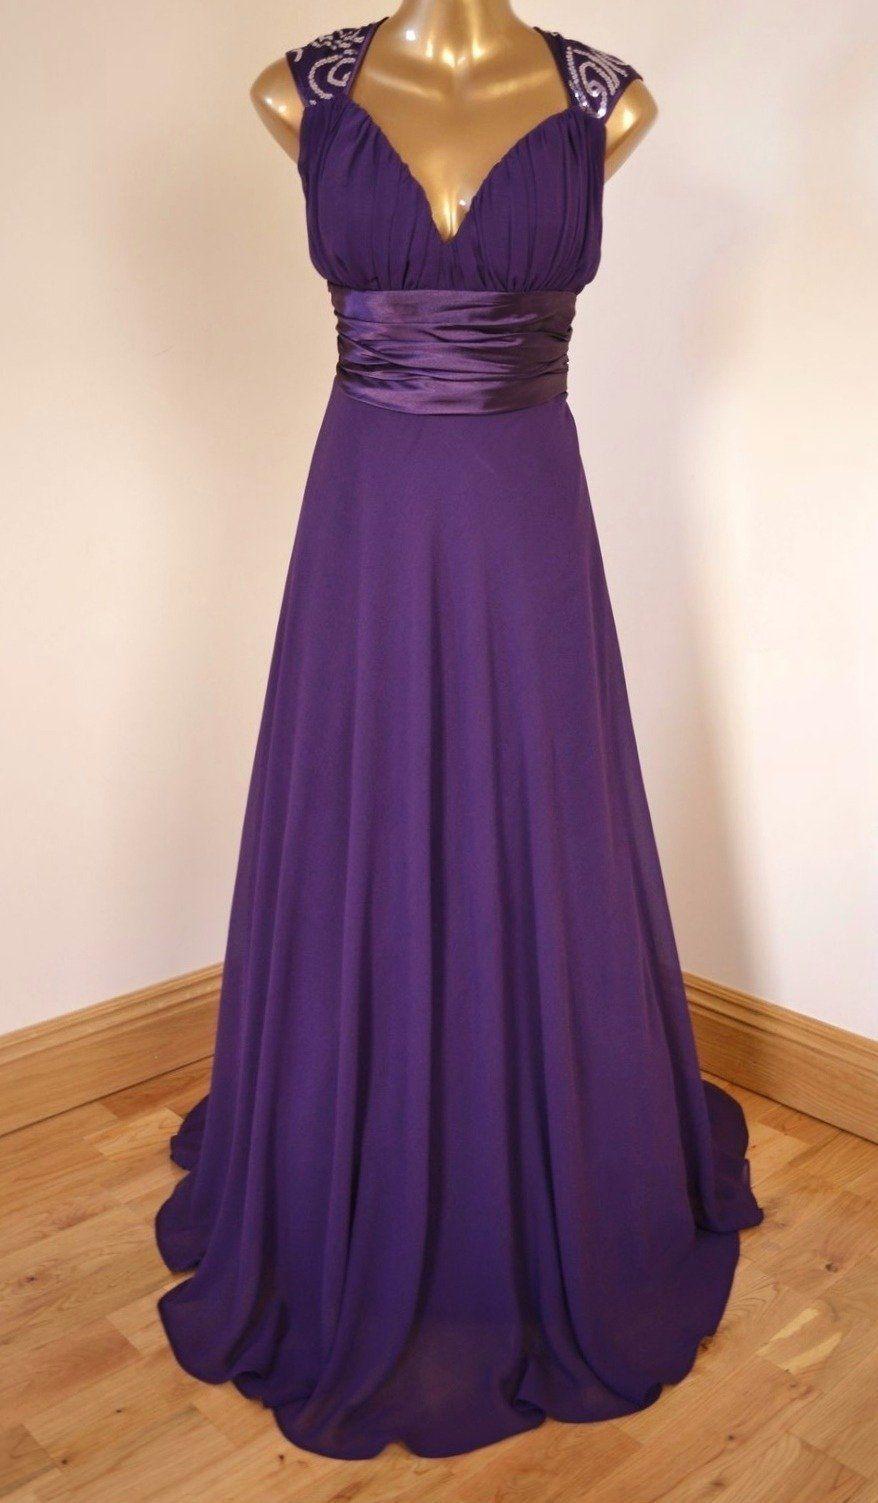 BNWT APHRODITE Purple Chiffon Sequin Evening Ballgown Dress Size UK ...